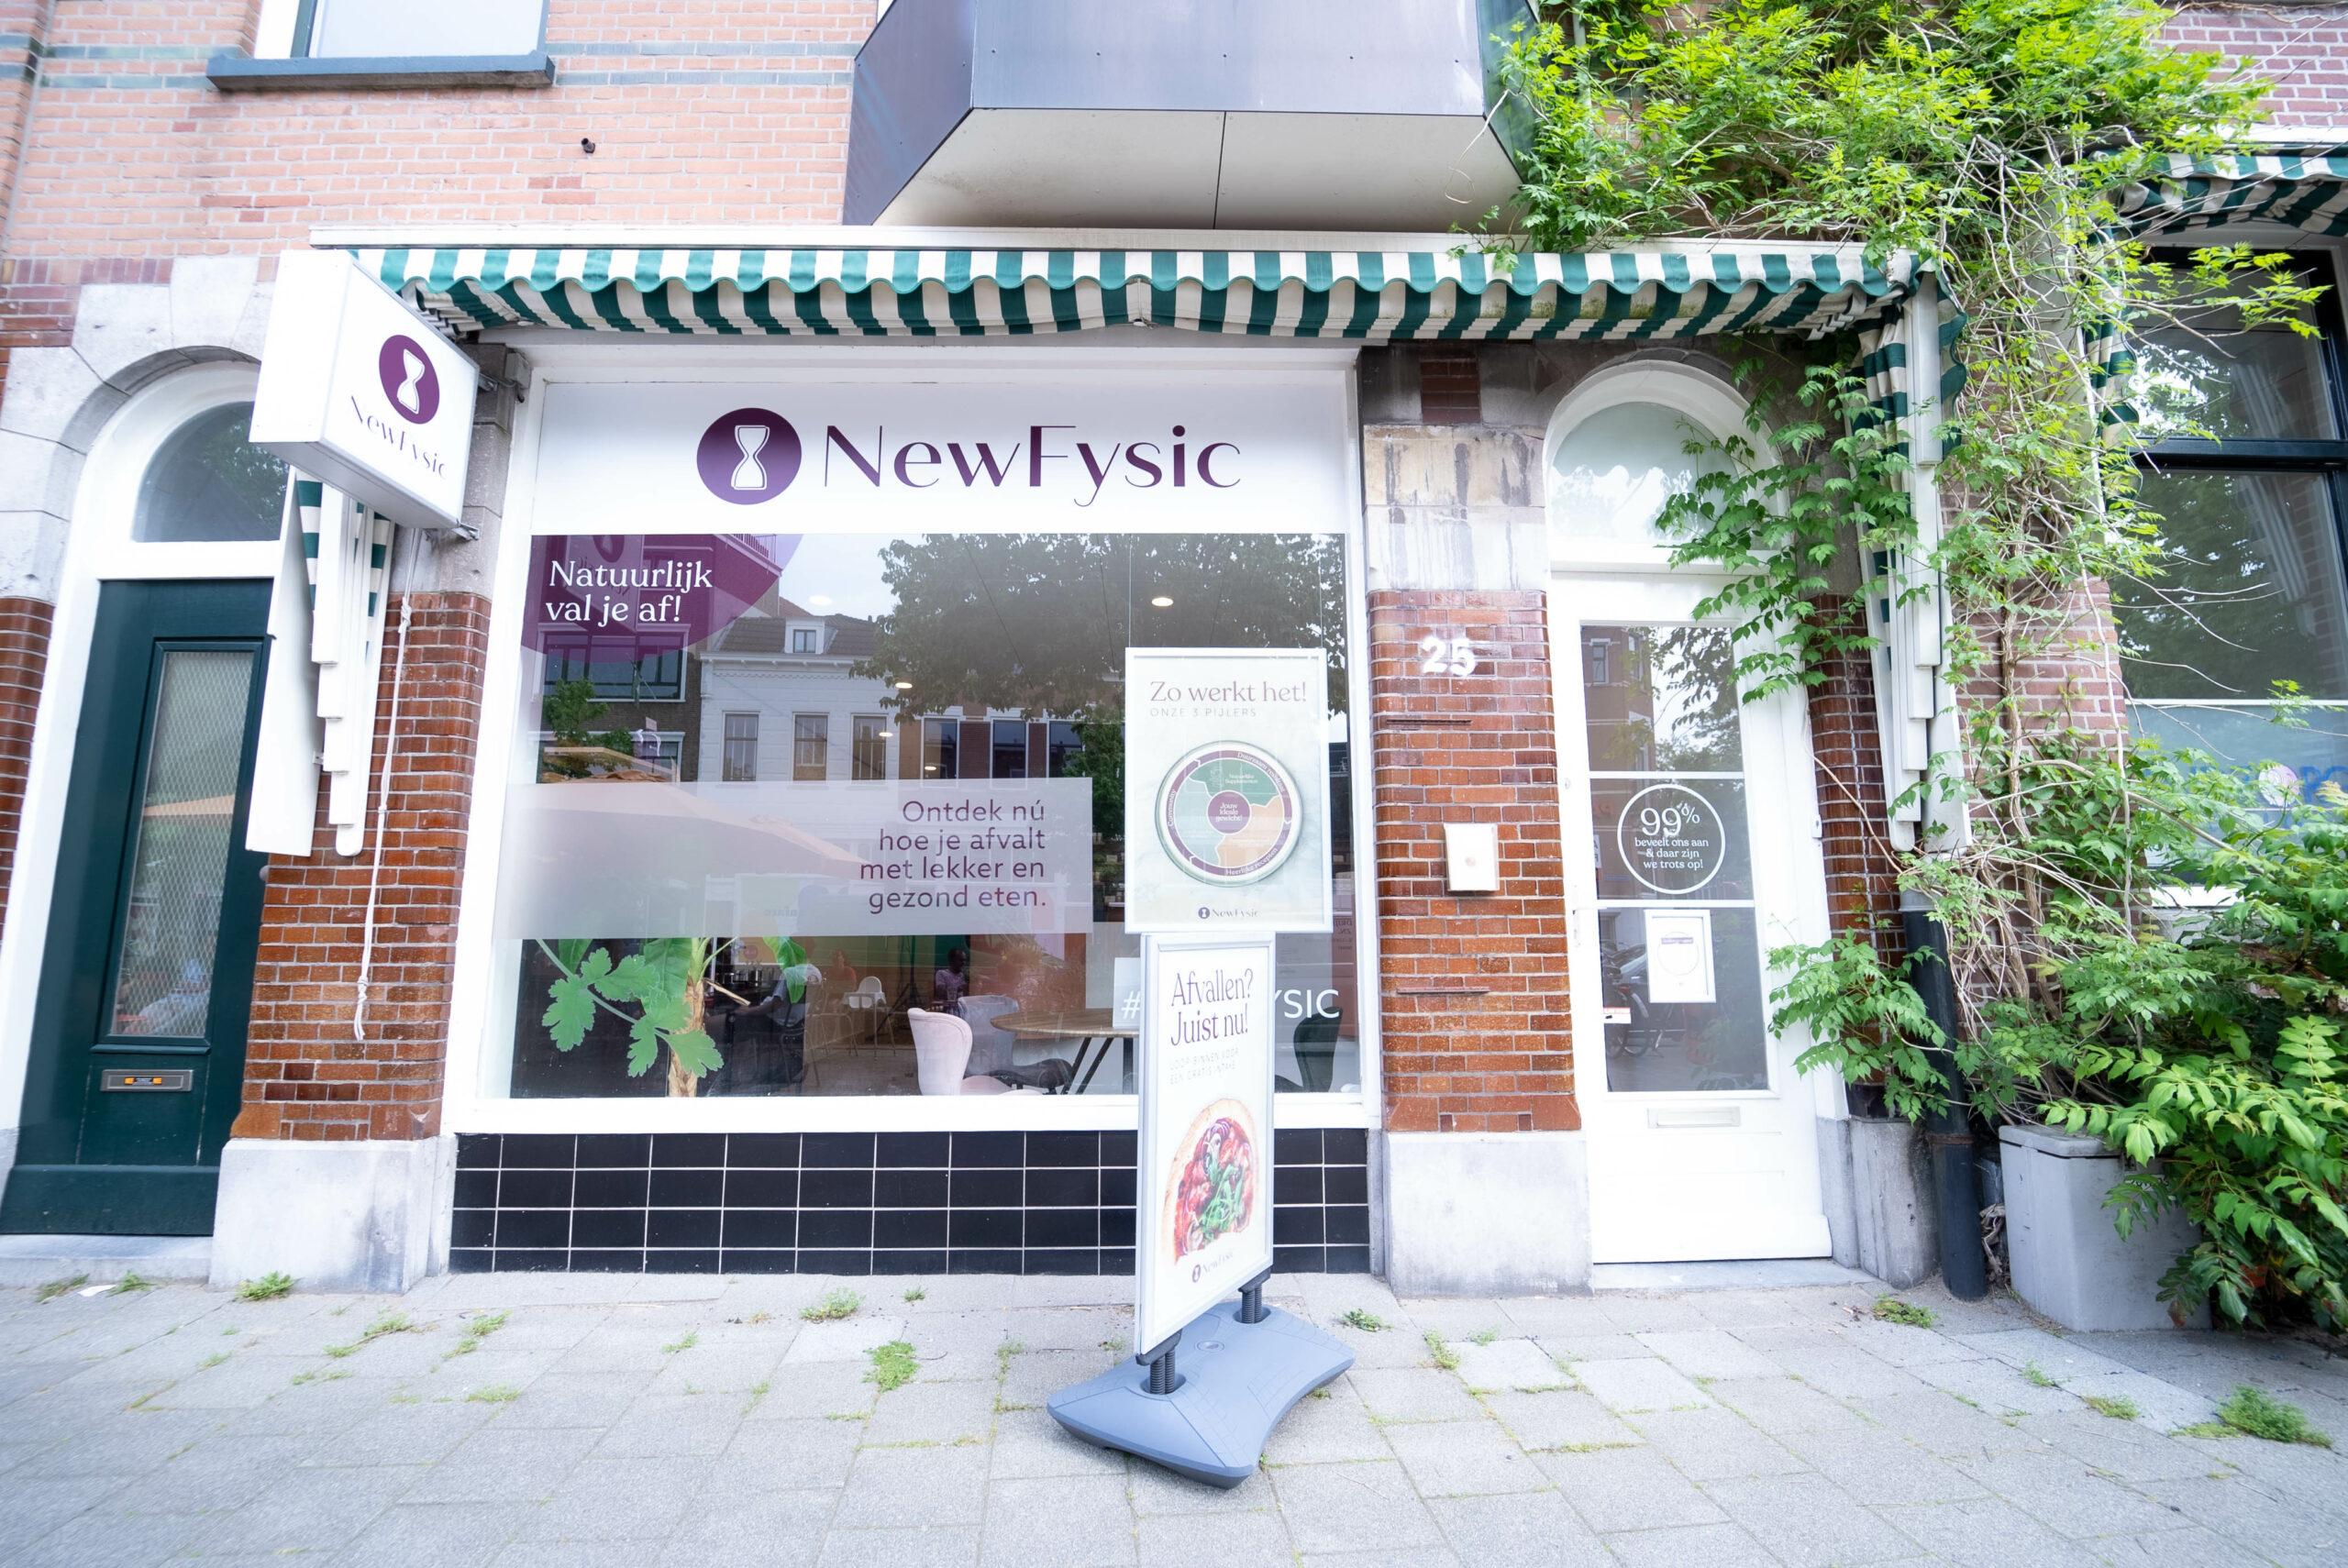 NewFysic Rotterdam – Kralingen